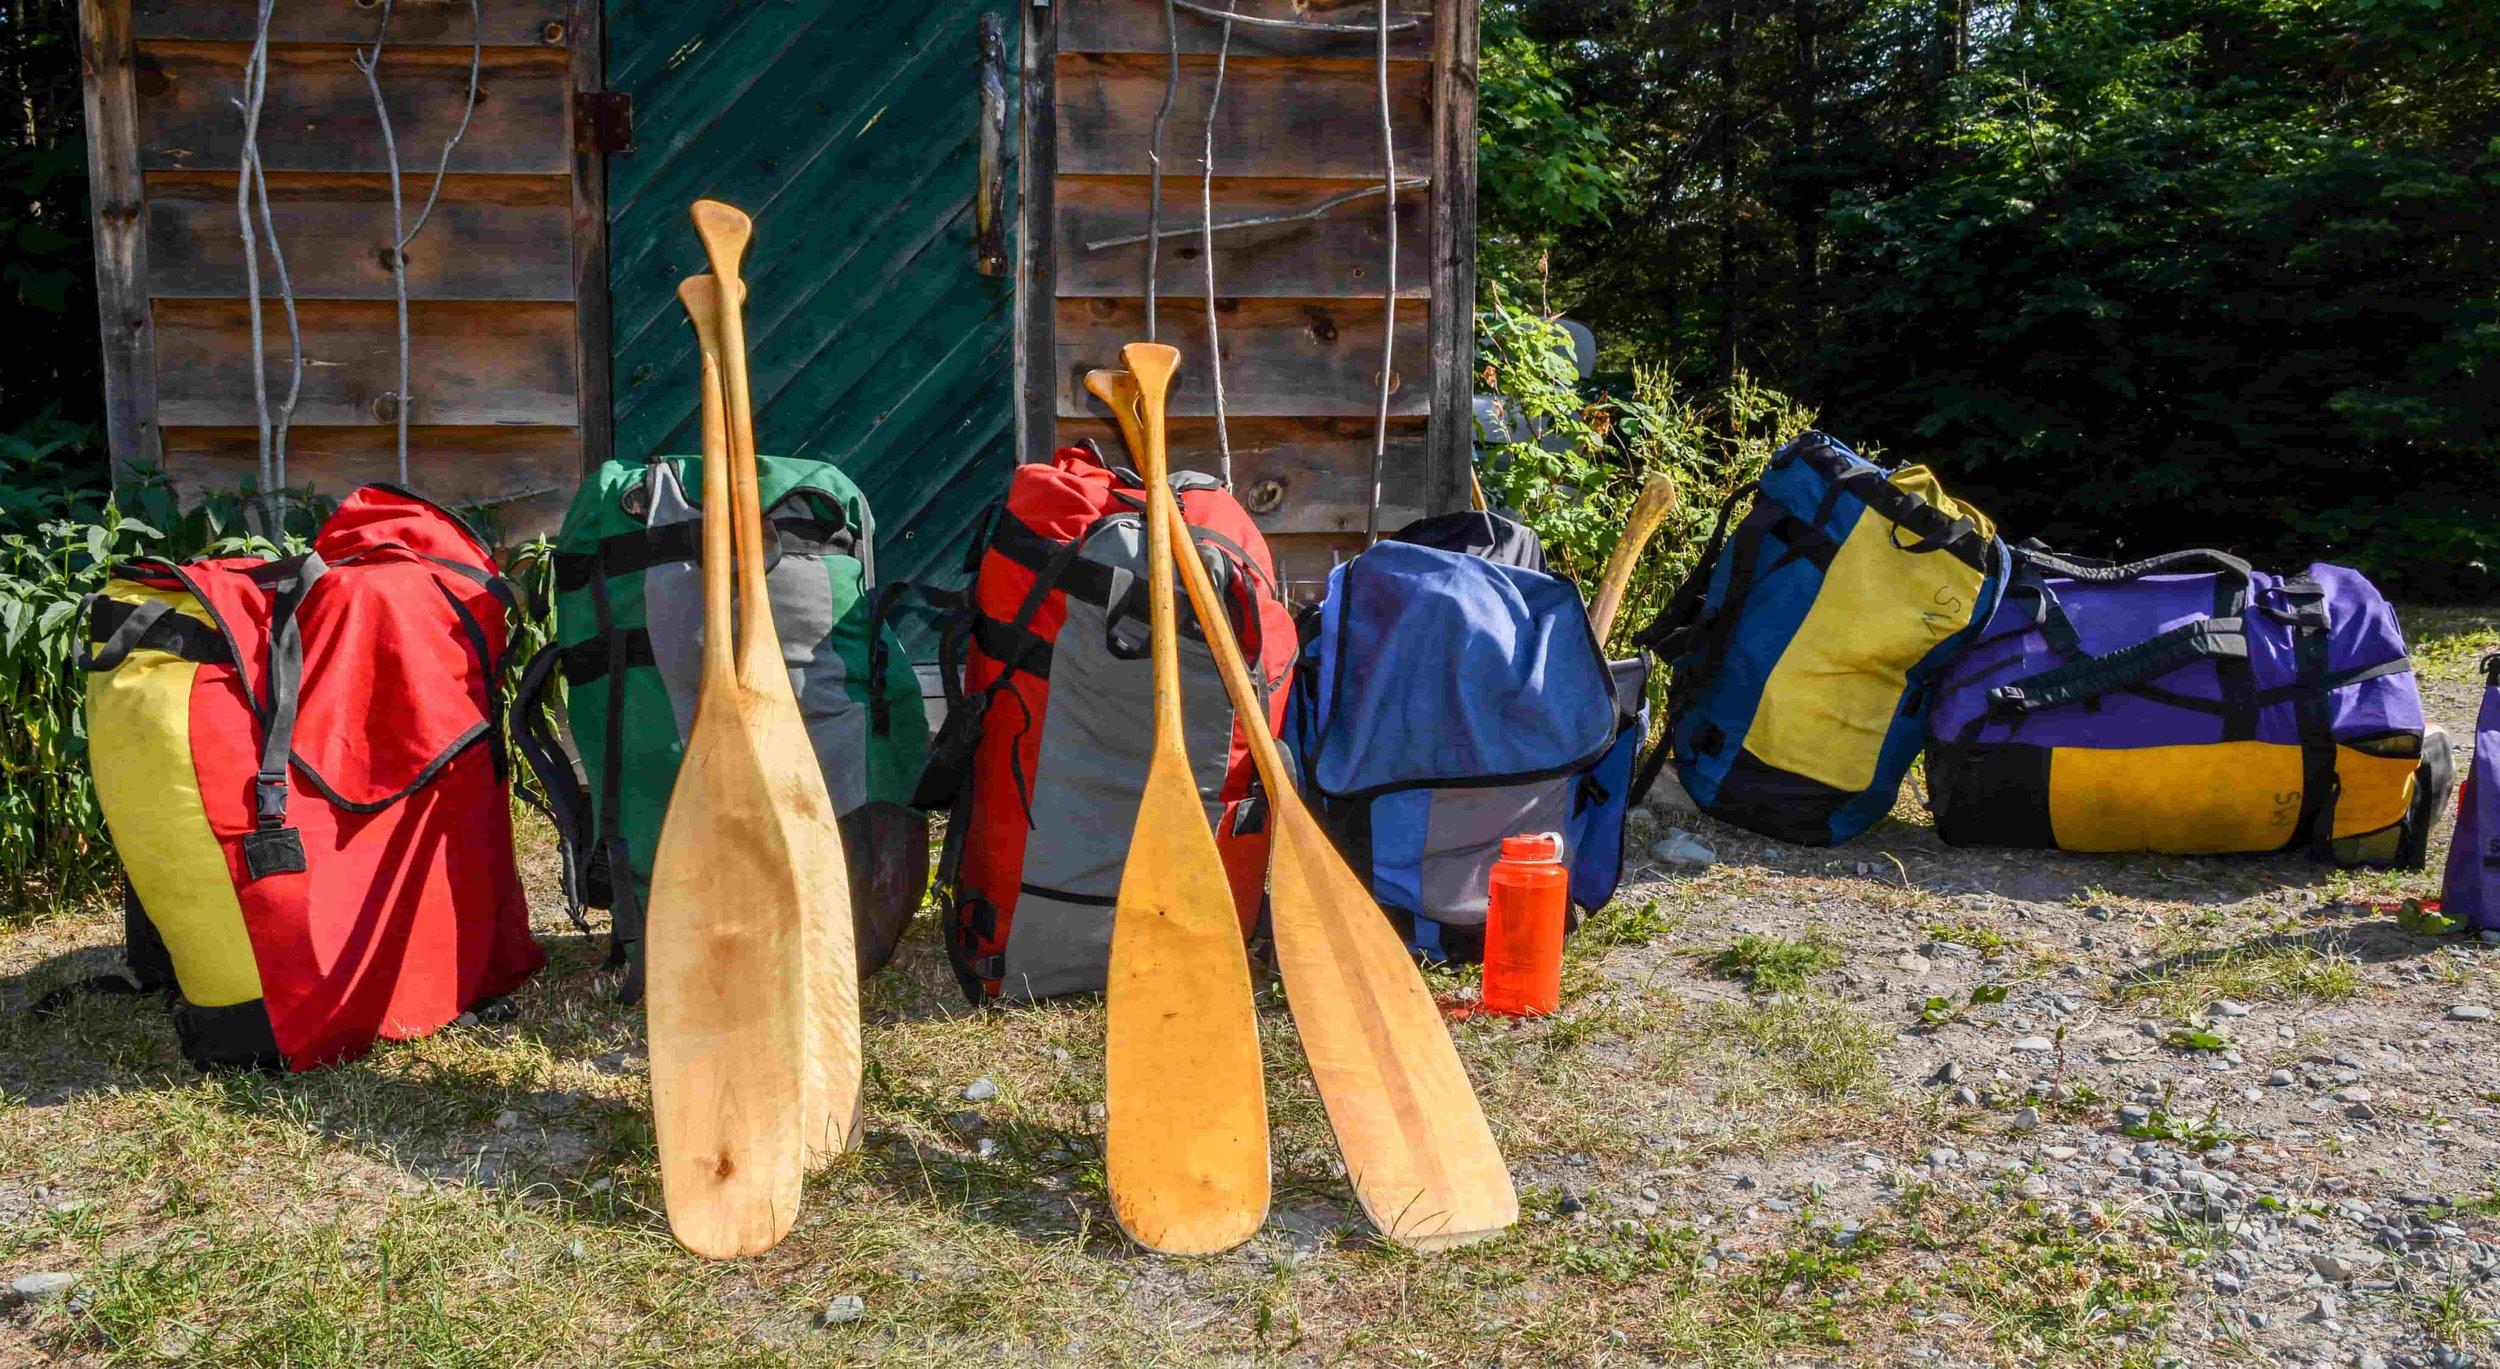 Canoe trip gear.jpg